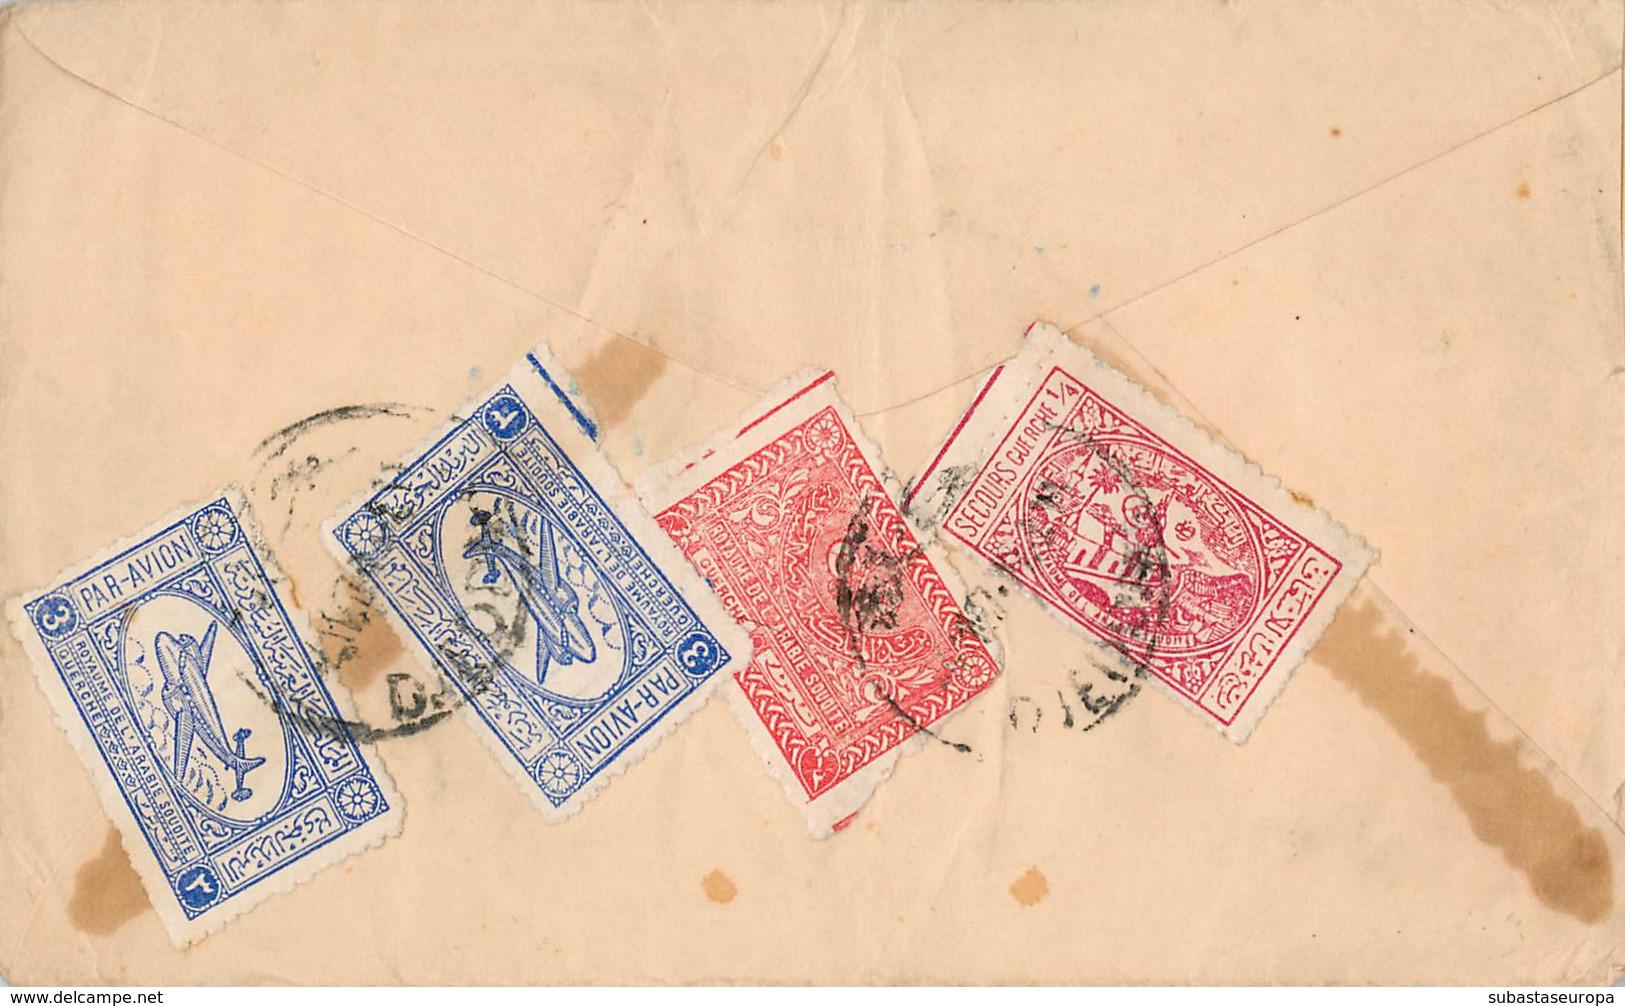 ARABIE SAUDITE. Cover Circulated. Stamps To Back. Air Mail. Postal History. - Arabia Saudita